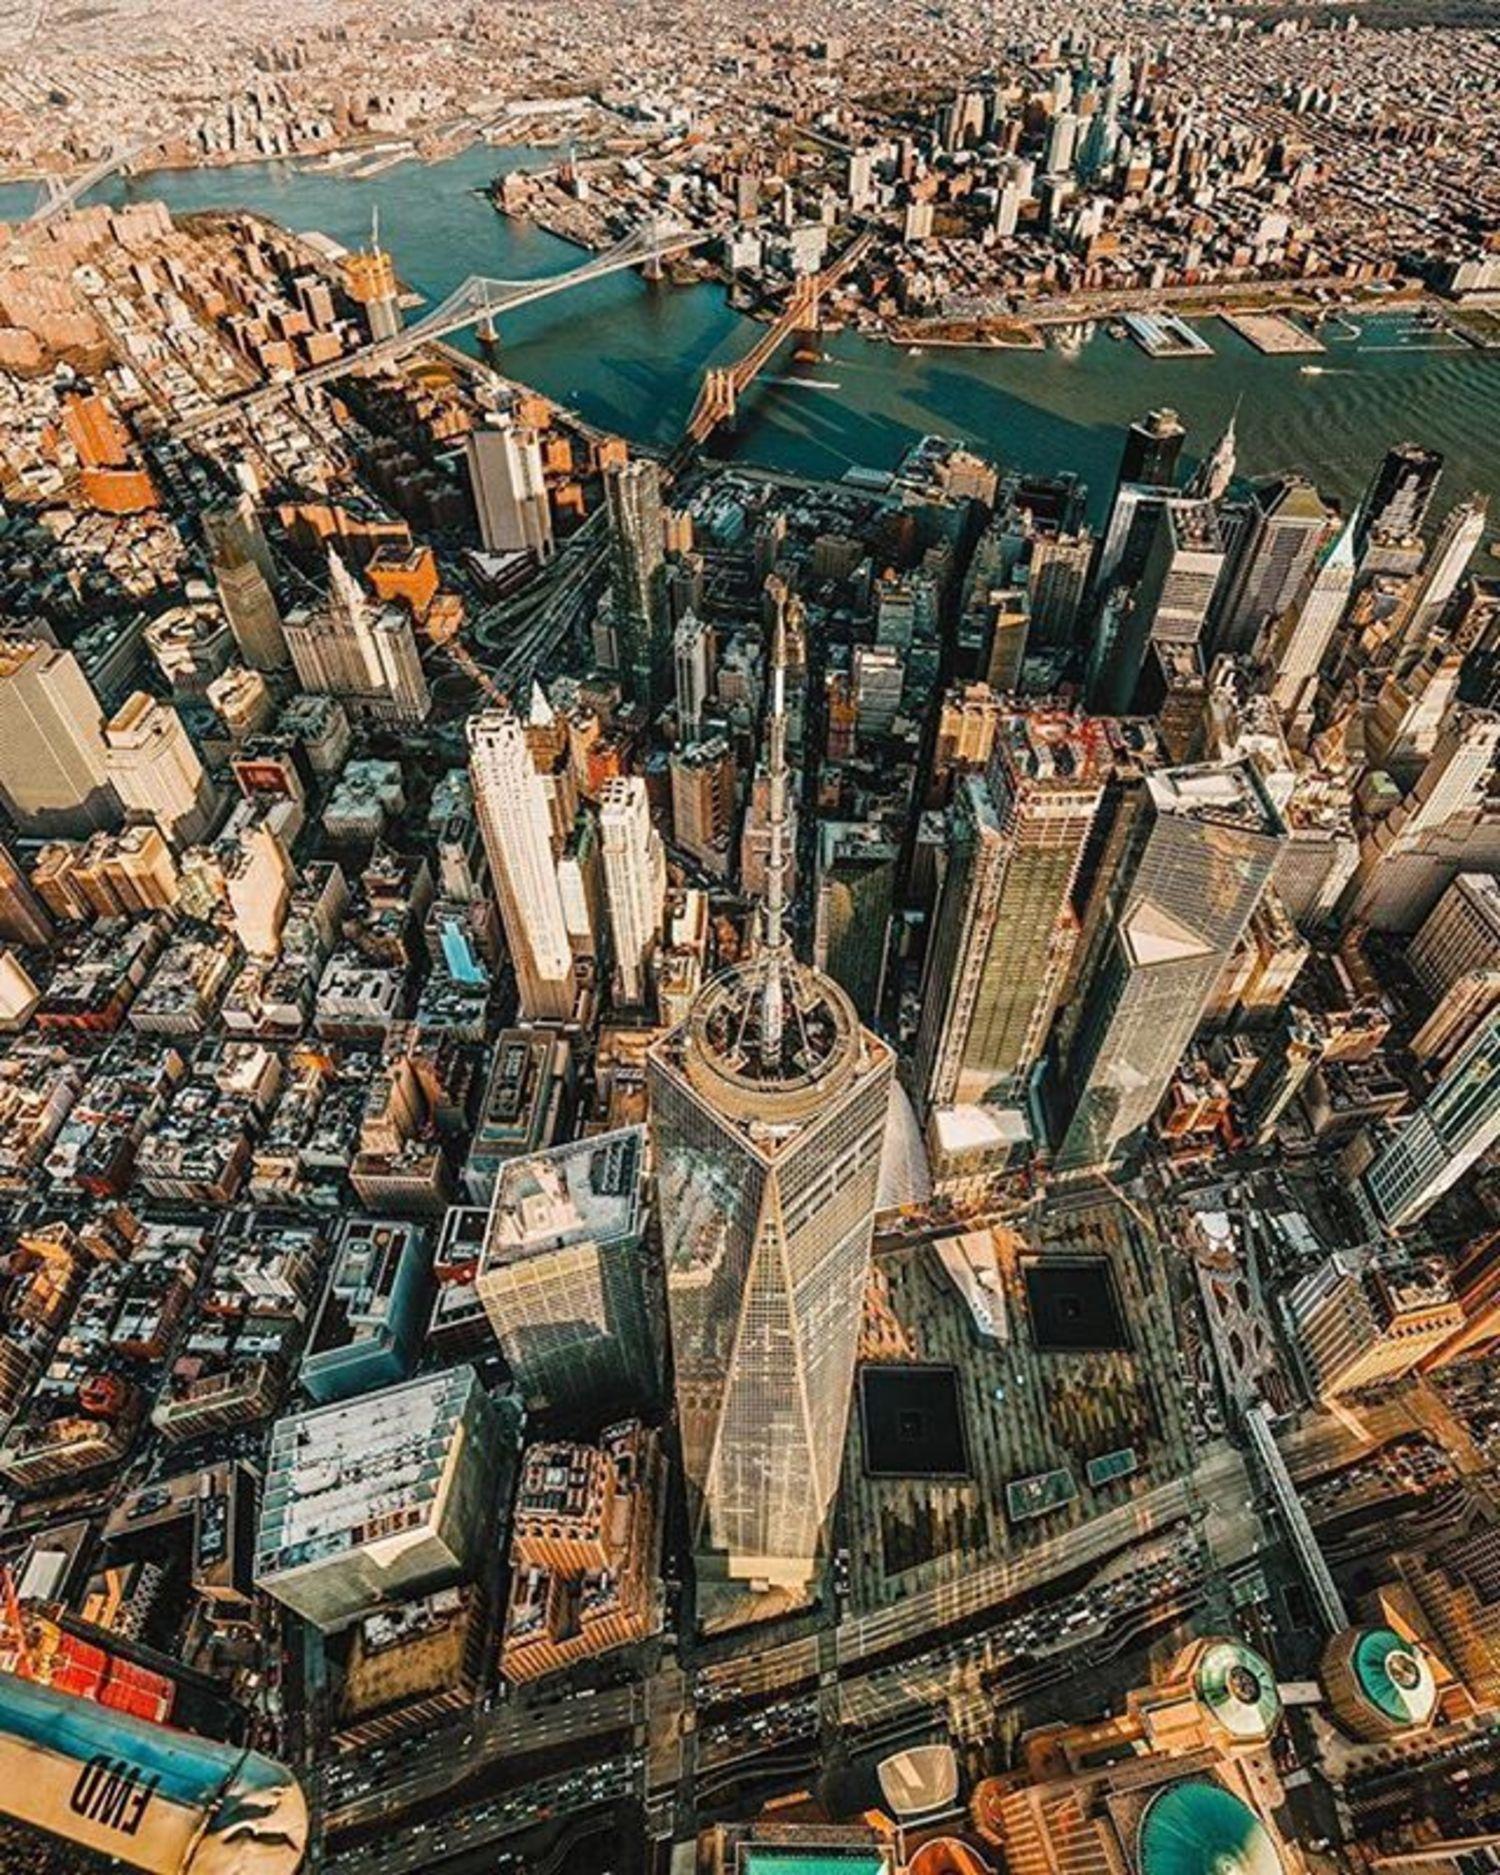 New York, New York. Photo via @mc_gutty #viewingnyc #newyorkcity #newyork